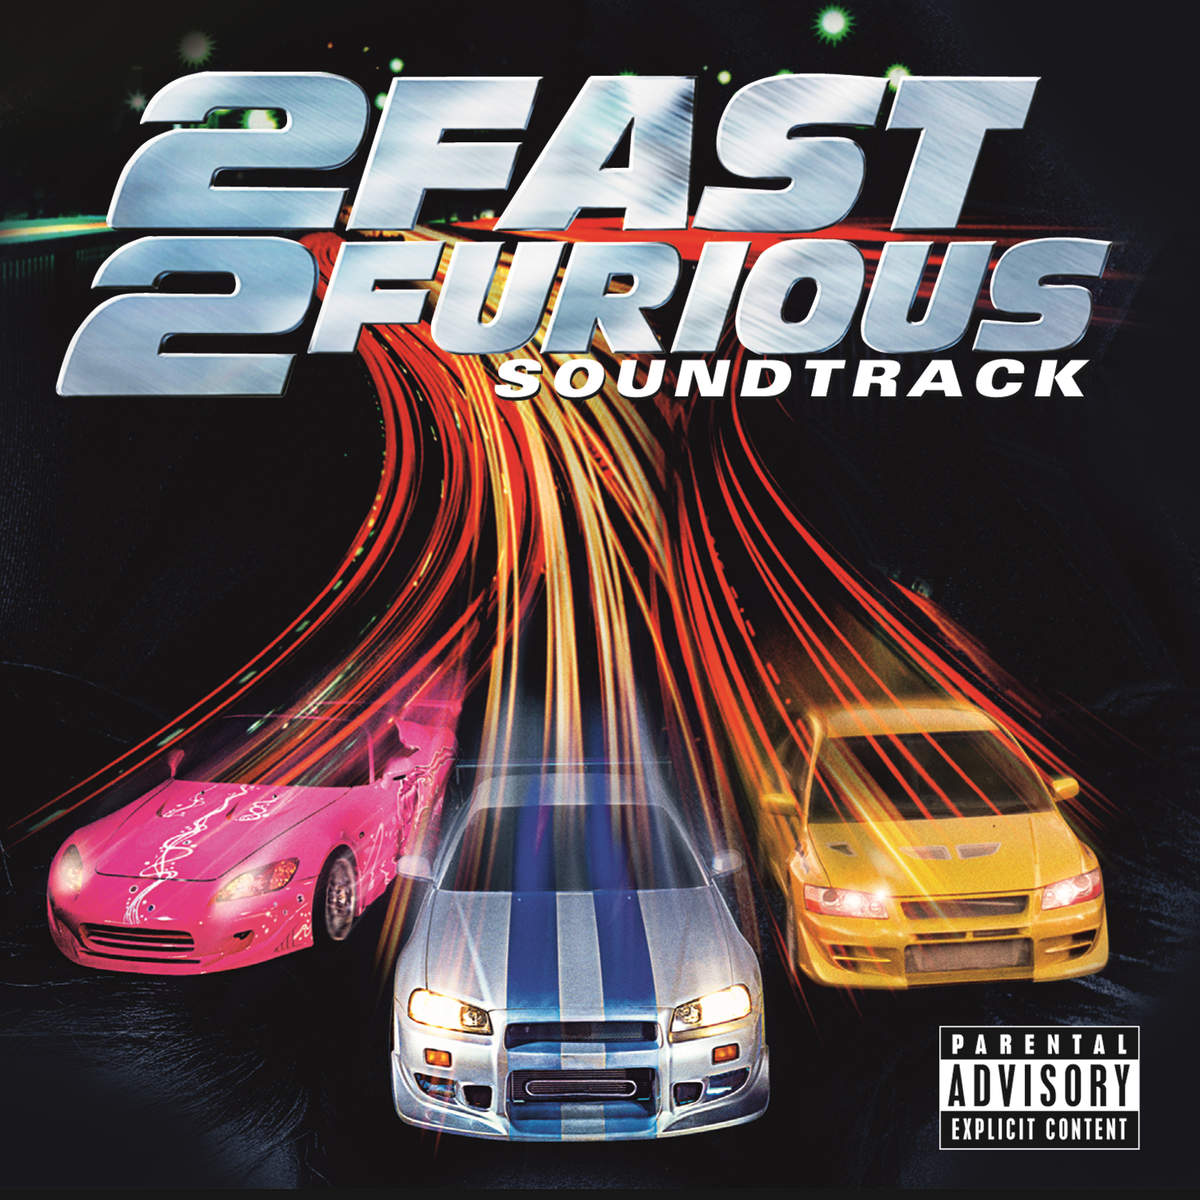 Fast Furios 1 2 3 4 5 6 7 - YouTube